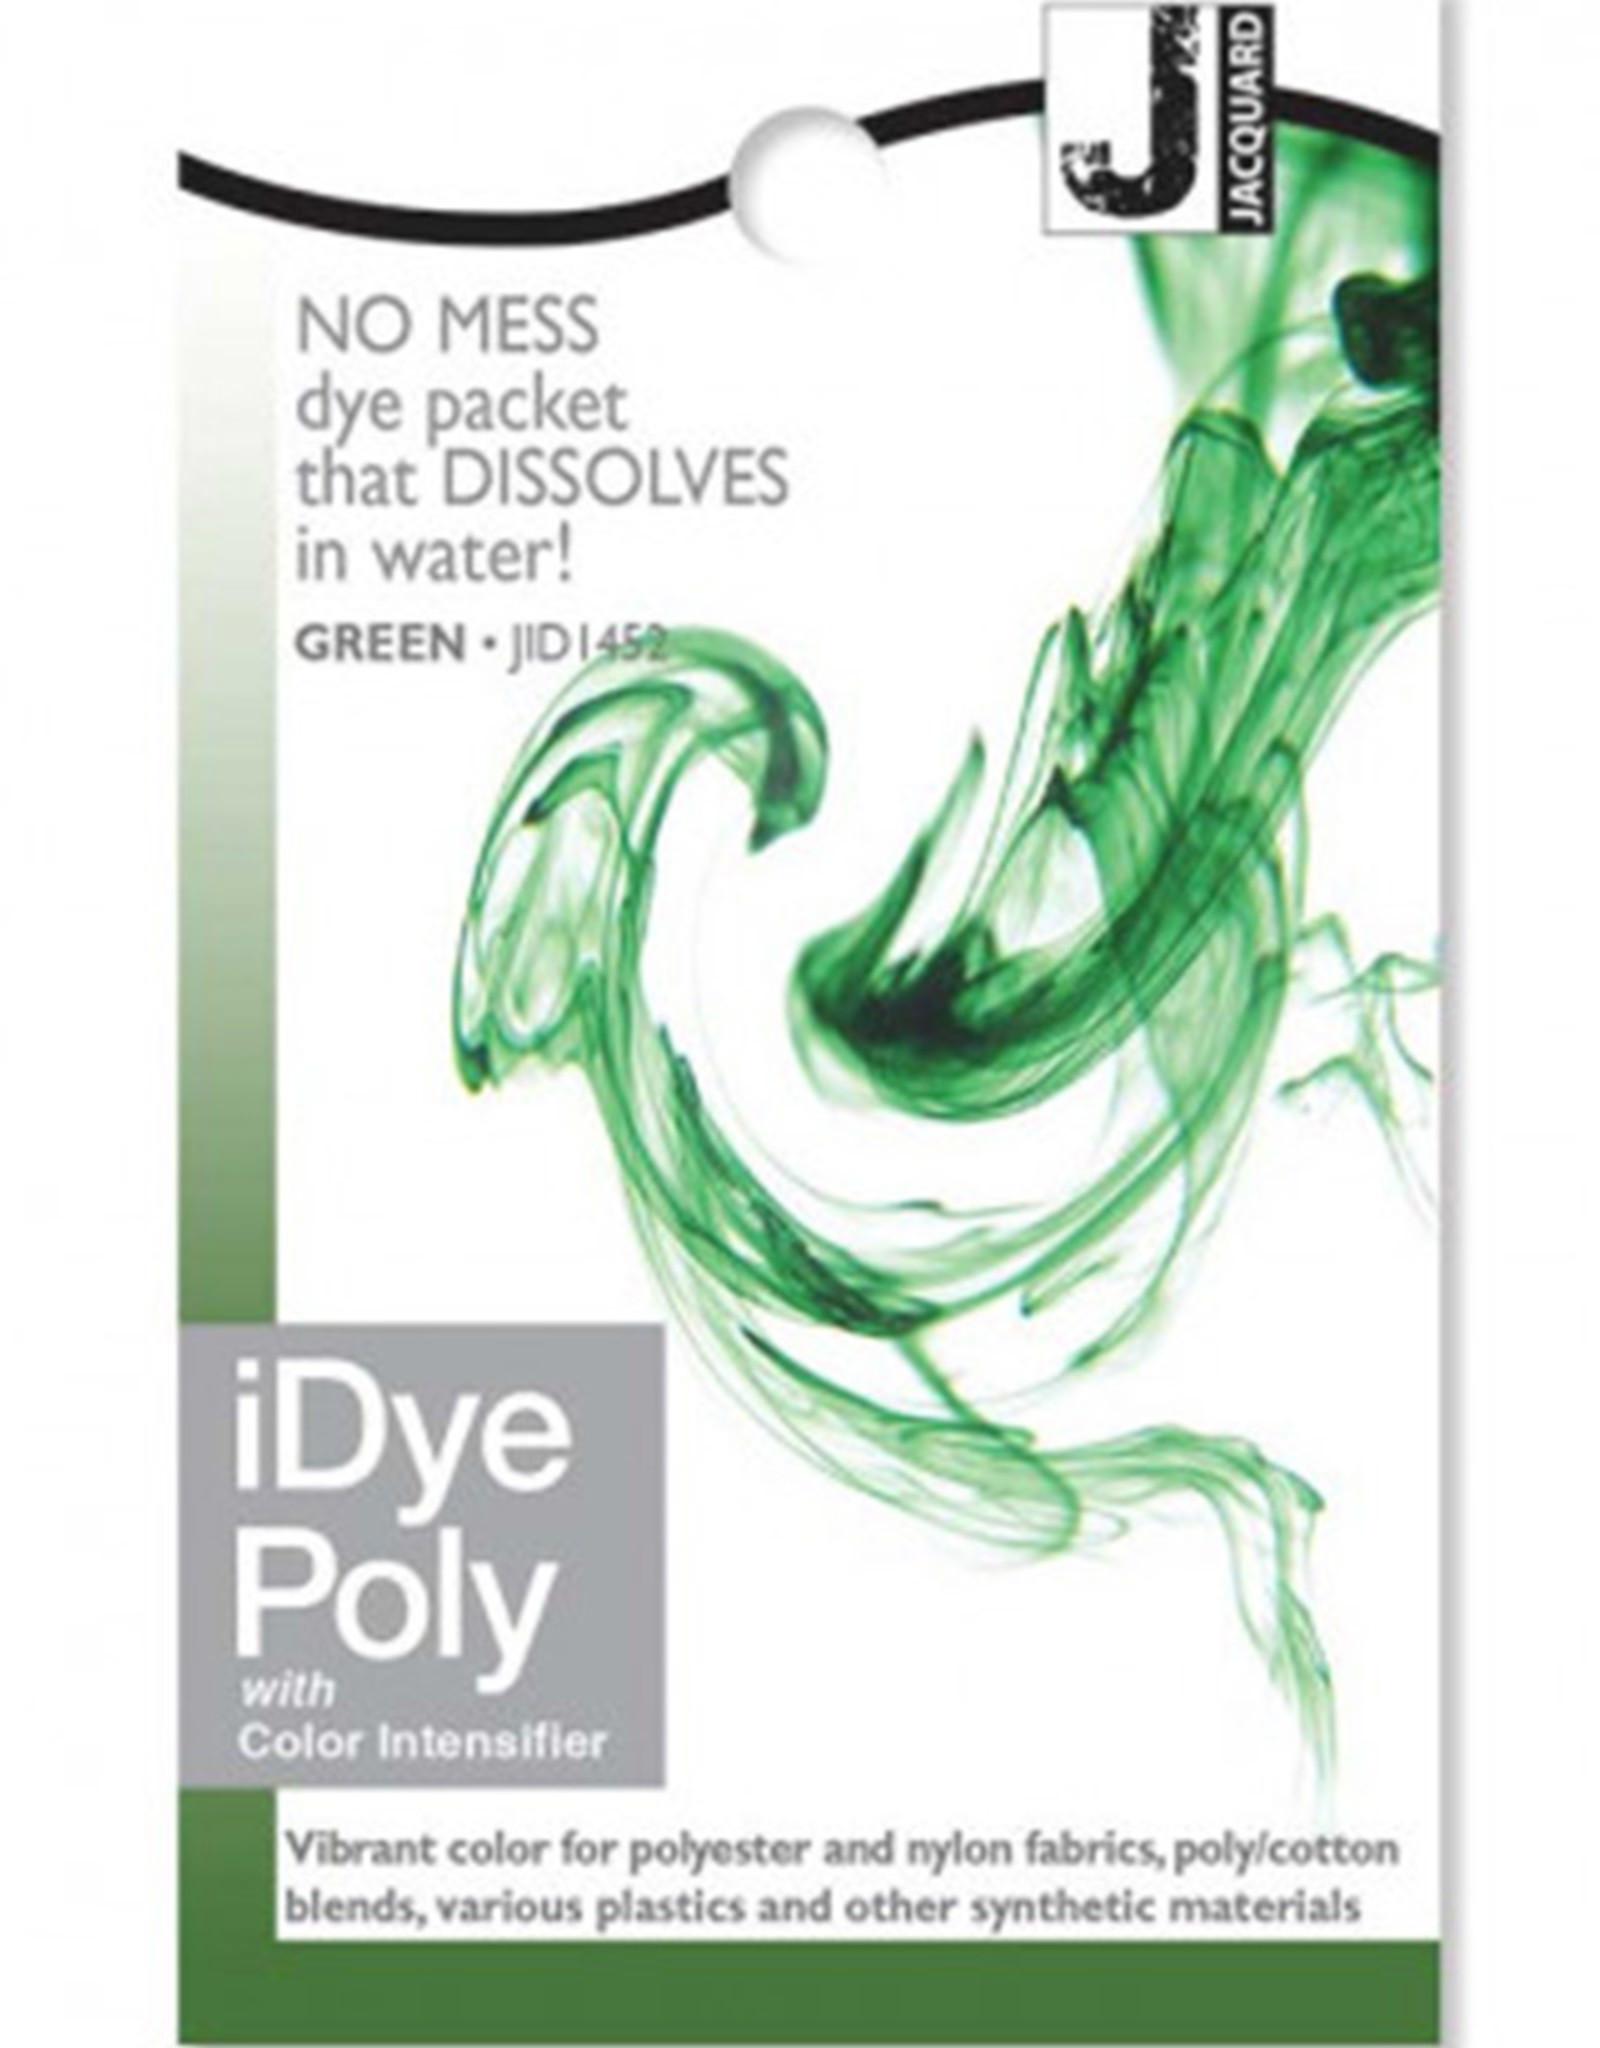 Jacquard iDye Poly Green